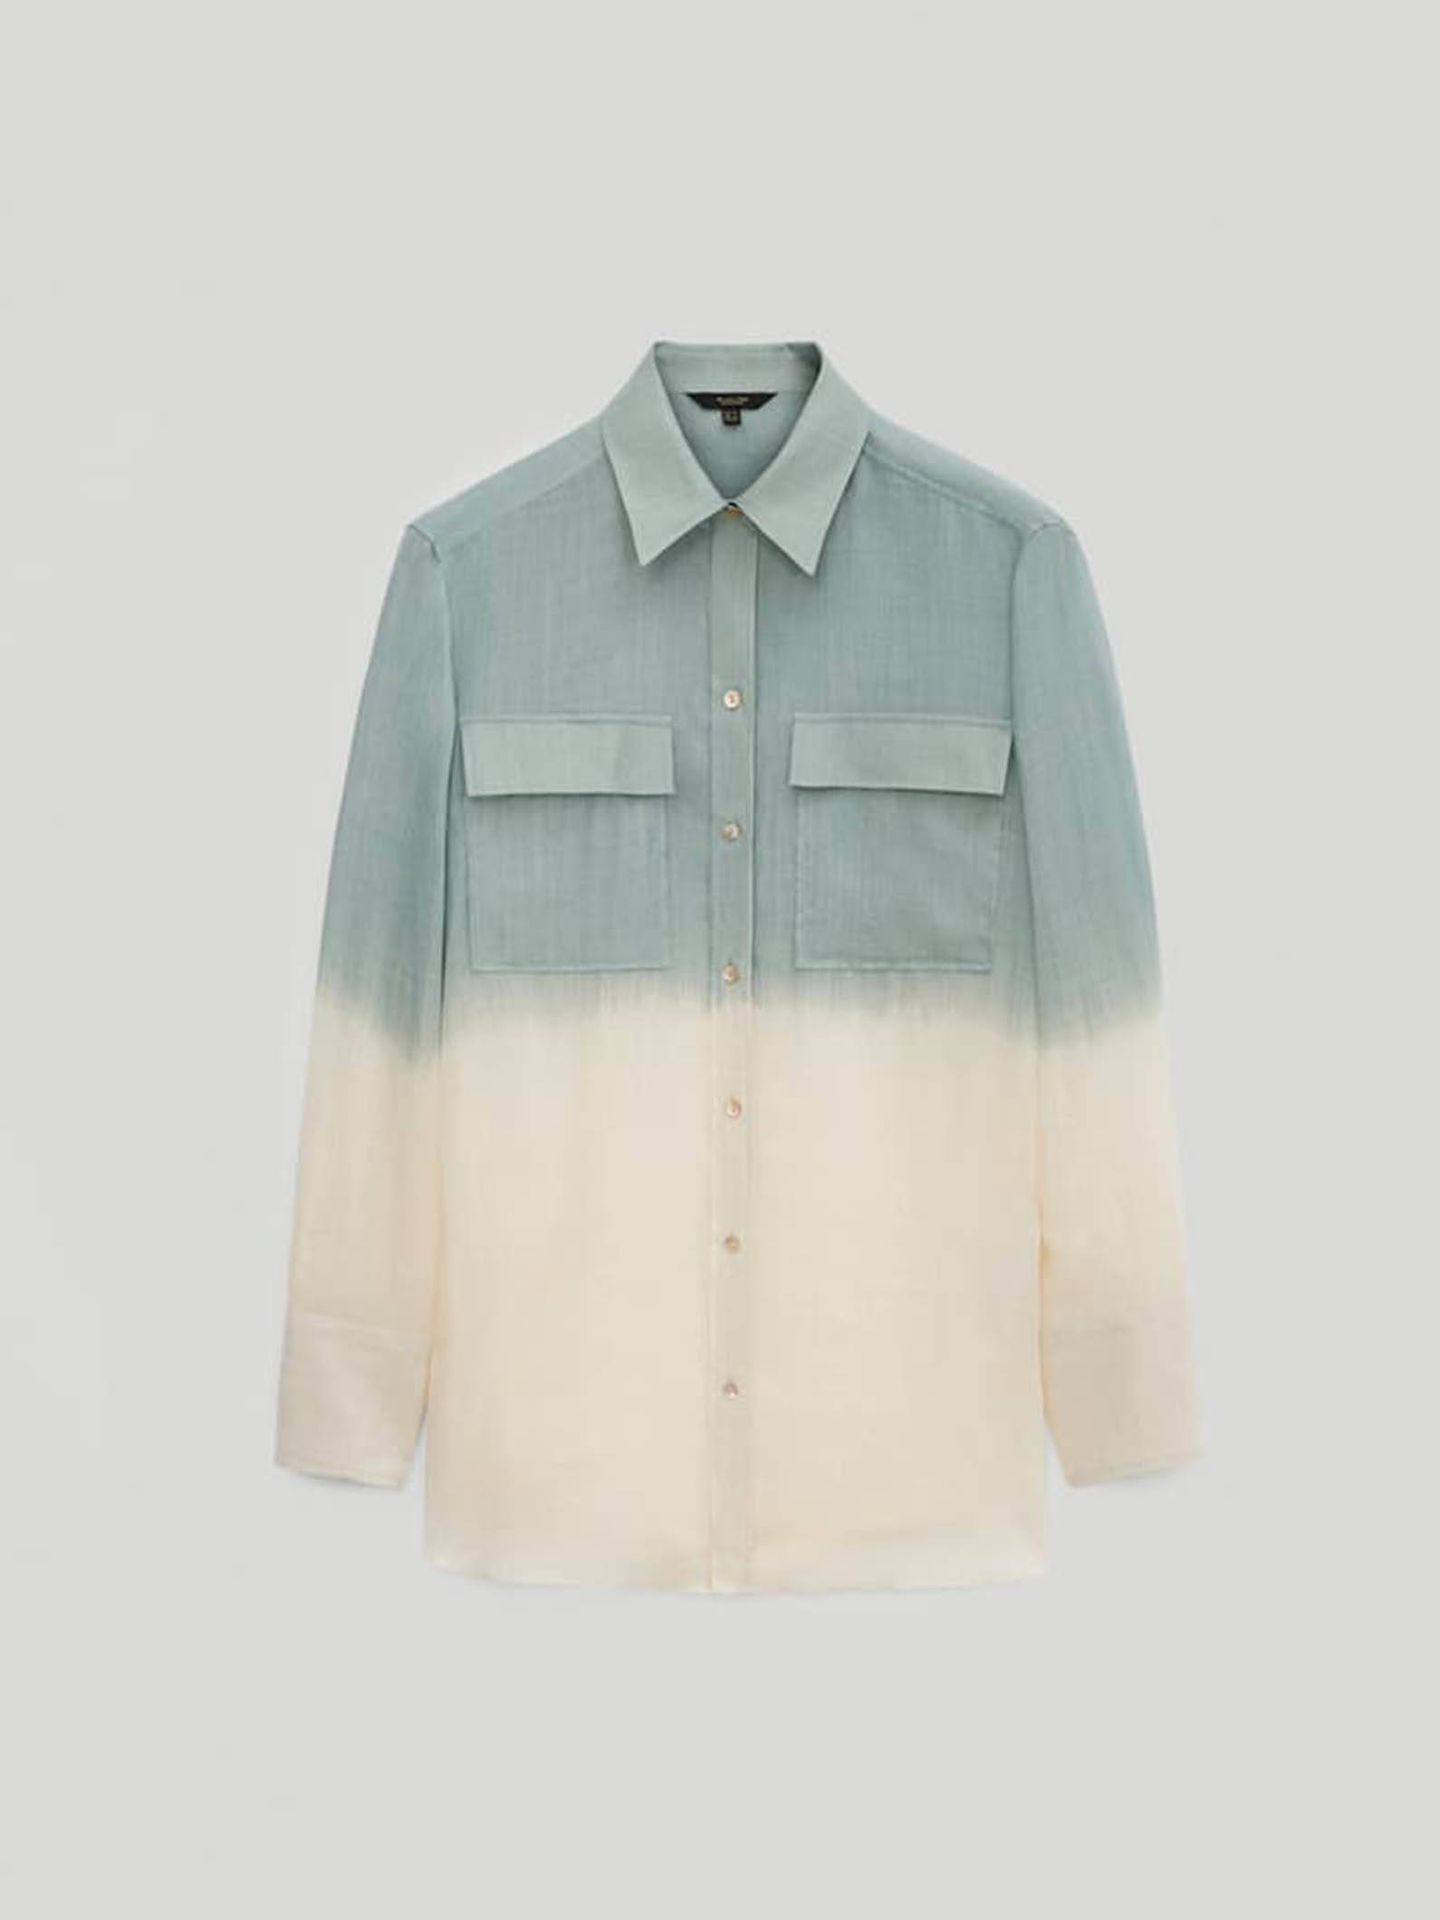 Camisa tie-dye de Massimo Dutti. (Cortesía)